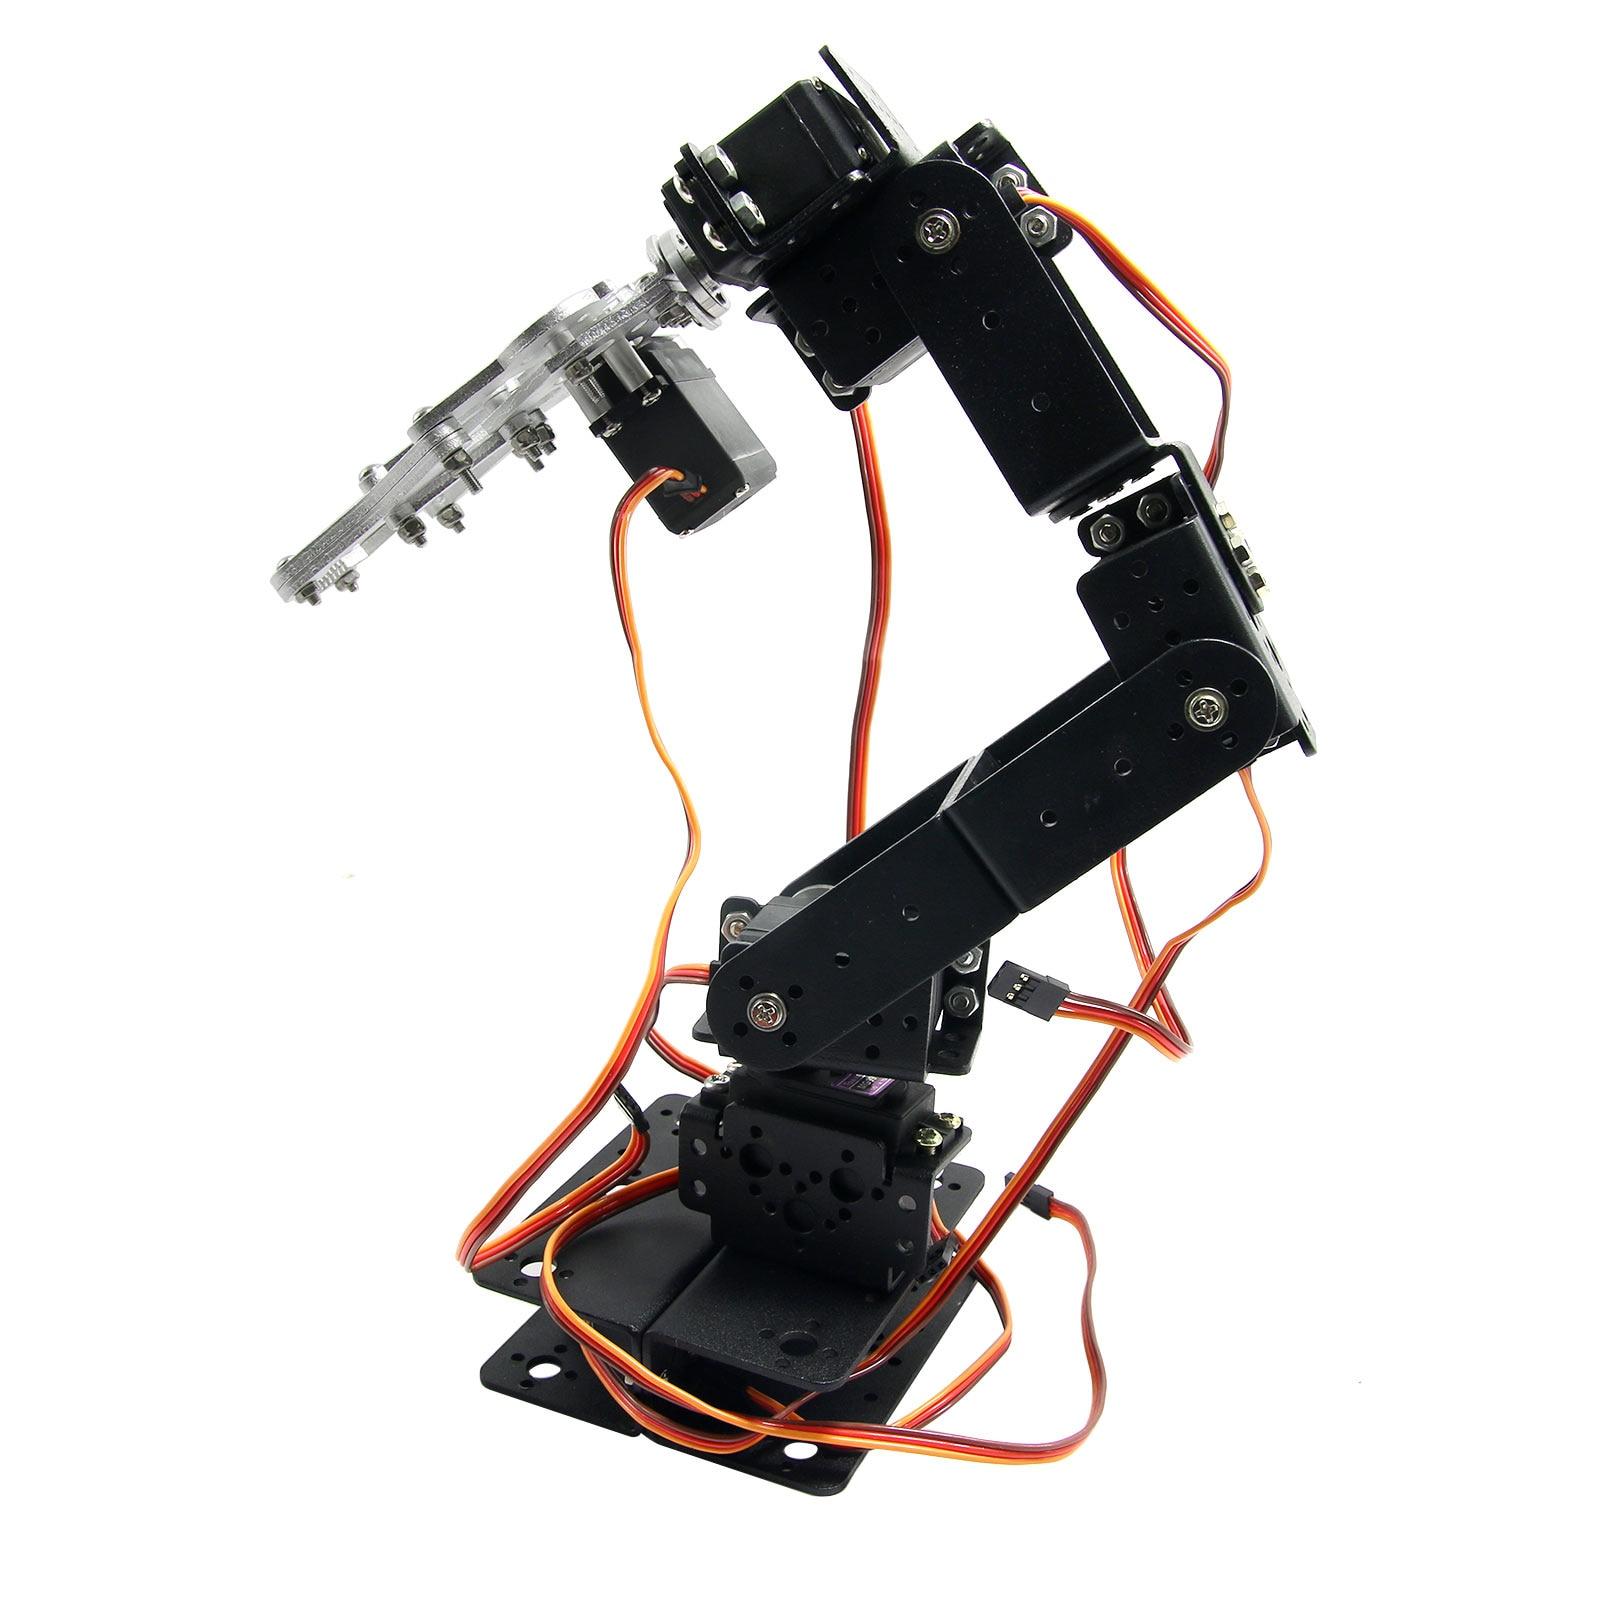 2U Aluminium Robot 6 DOF Arm Mechanical Robotic Arm Clamp Claw Mount Kit &  MG996R Servos & 32CH Controller for Arduino